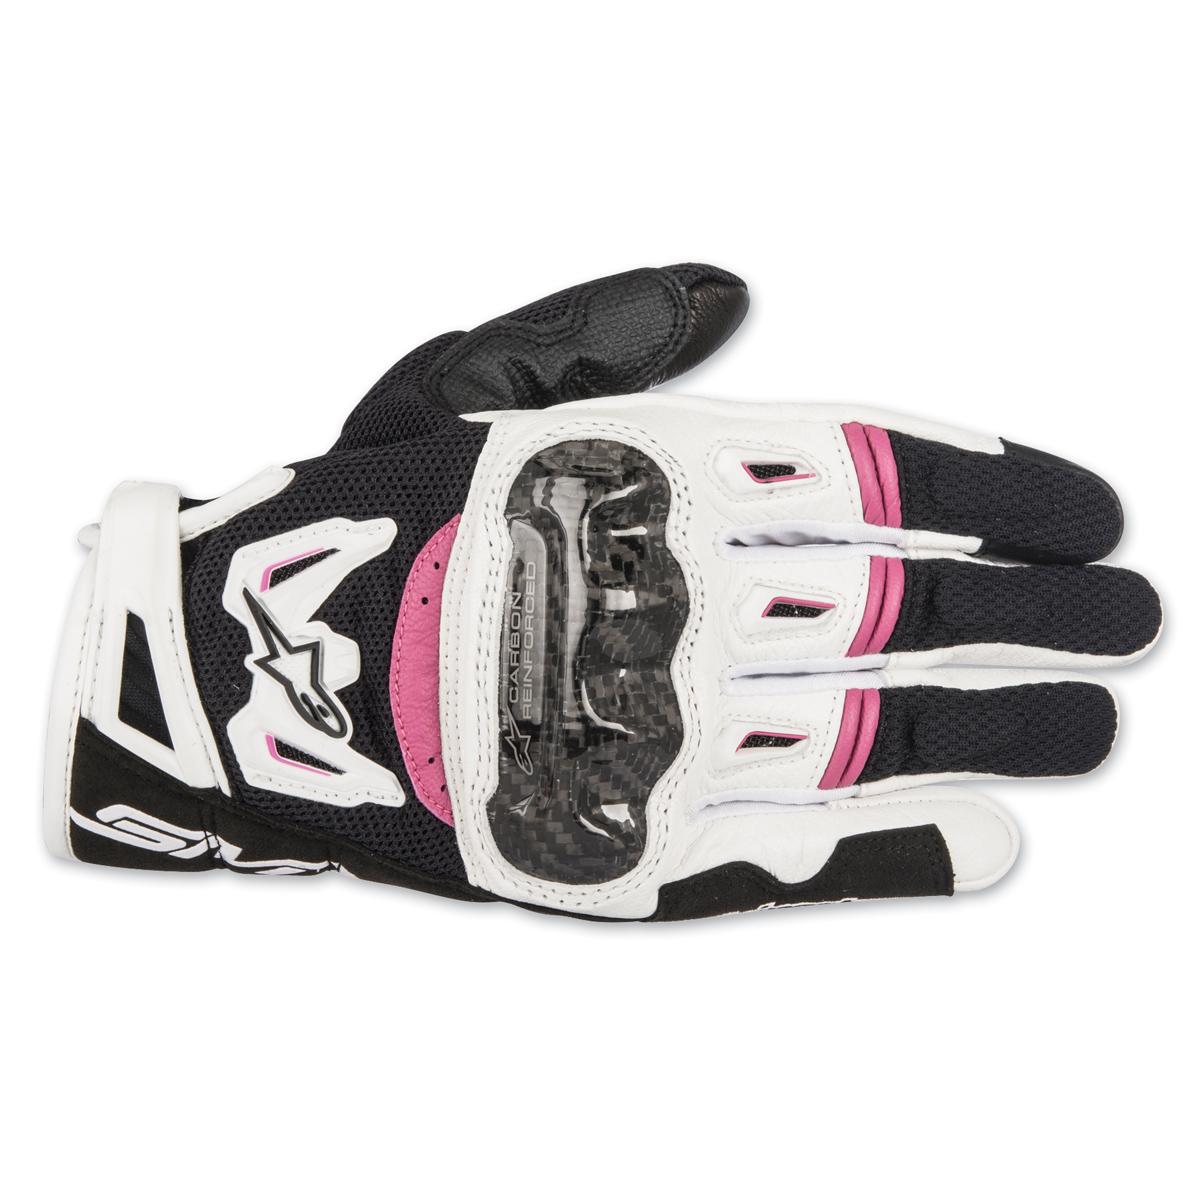 Alpinestars Women's Stella SMX-2  v2 Air Carbon Black/White/Pink Gloves